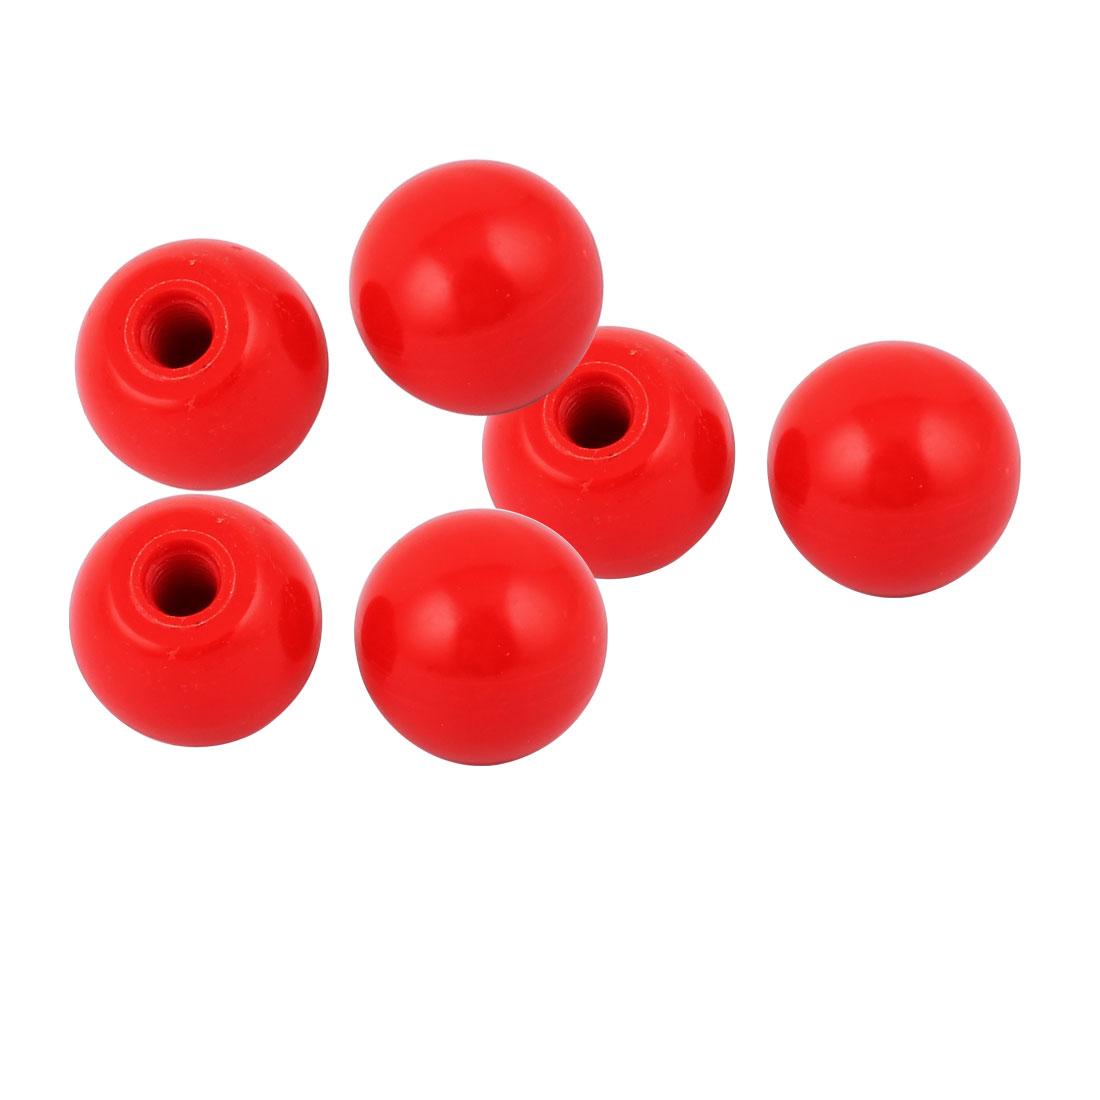 6 Pcs M10 Thread Round Plastic 35mm Diameter Ball Knob Handle Red